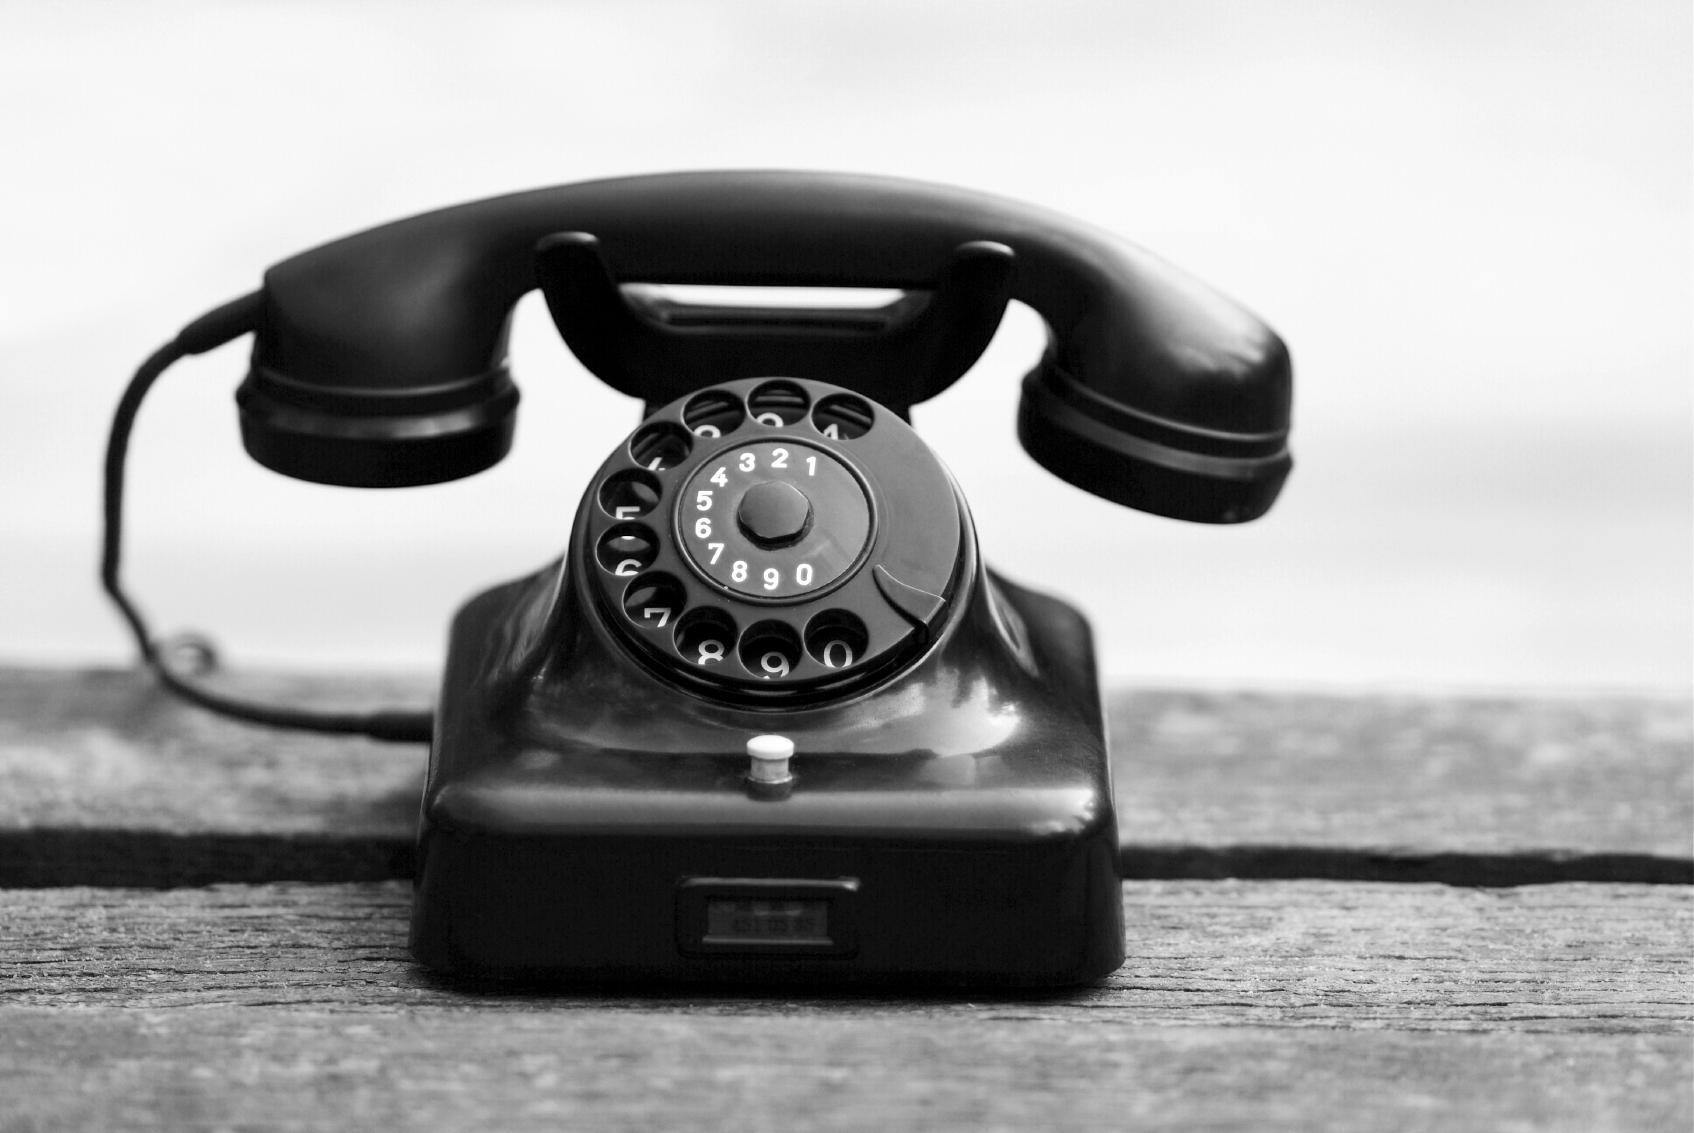 Old-fashioned-phone.jpg